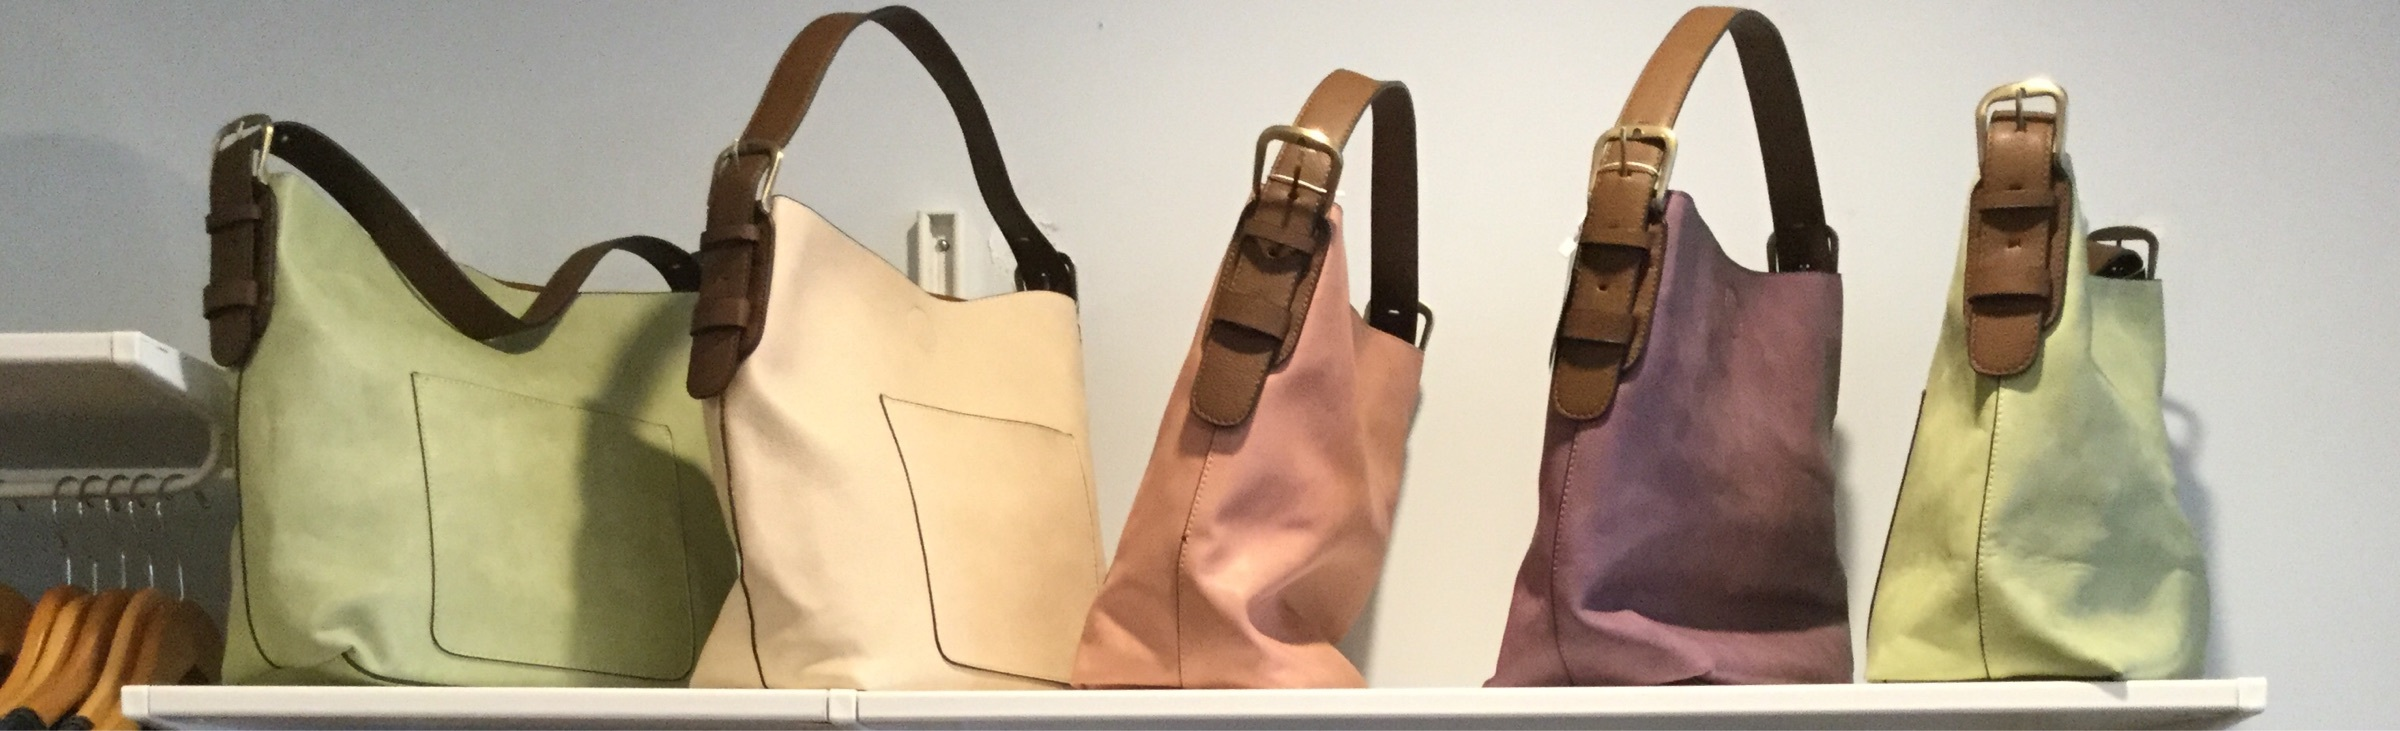 Handbags_Hobo